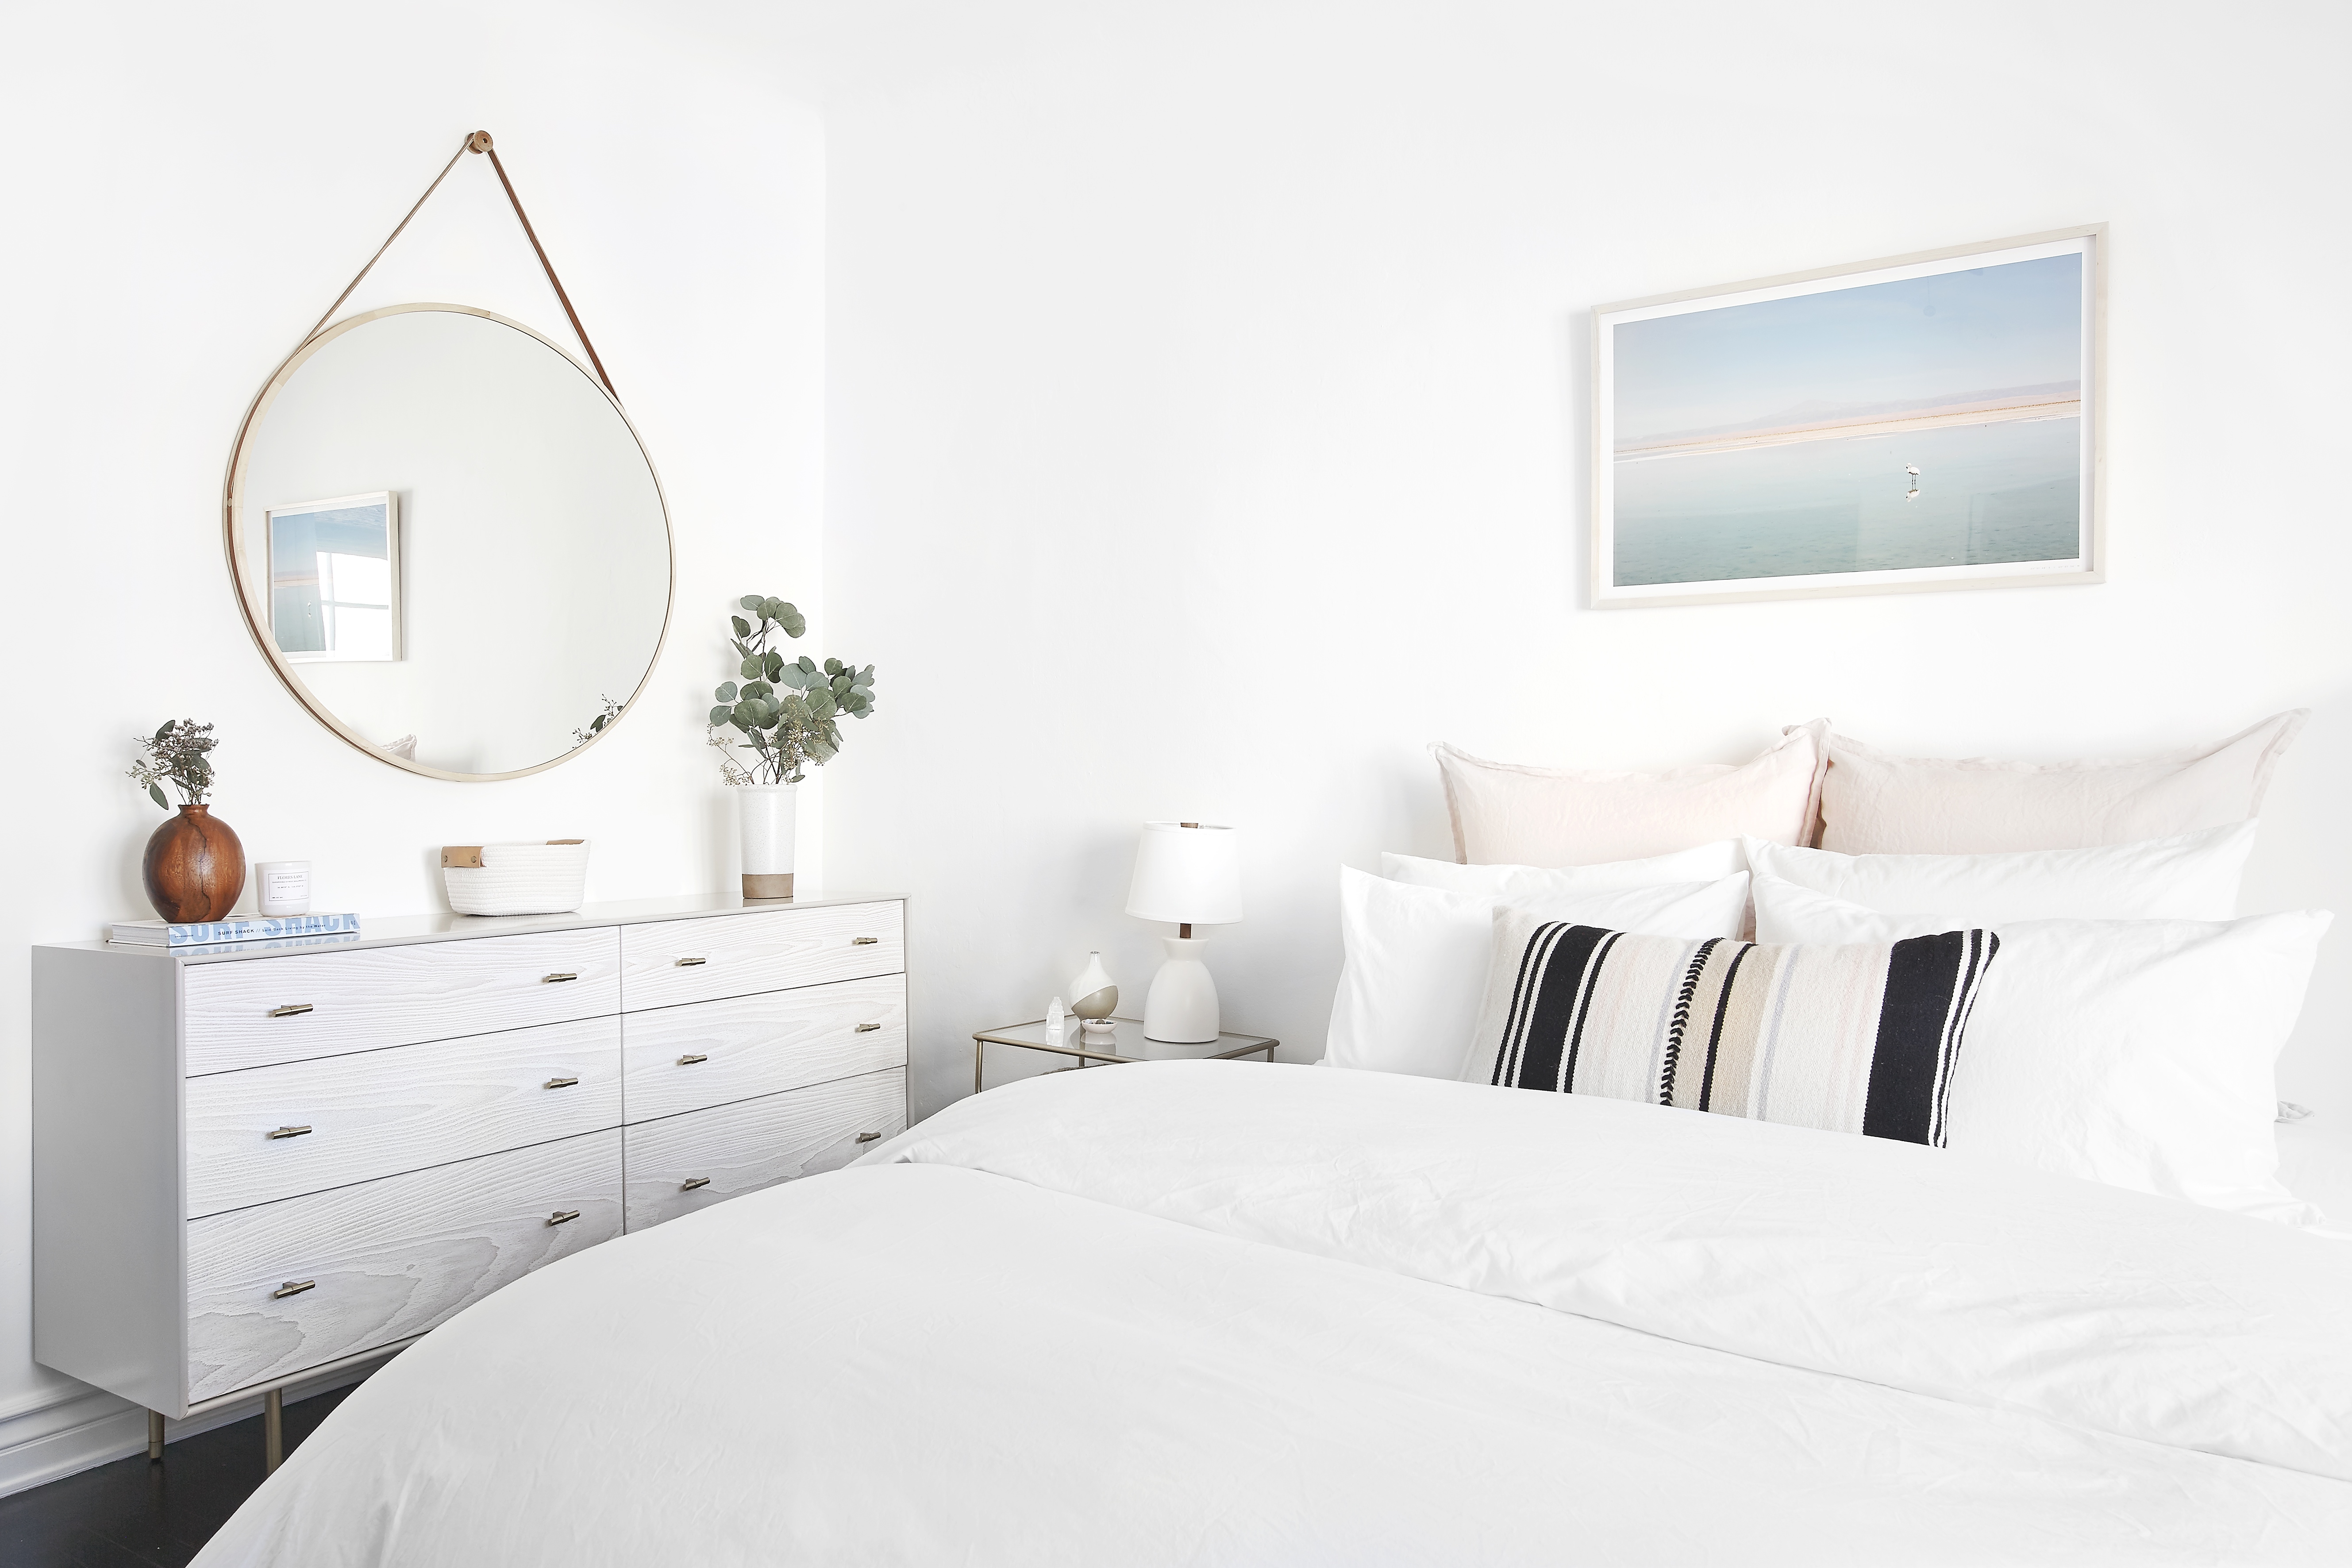 A sleep sanctuary with plush white bedding, minimal décor and fresh eucalyptus in vase